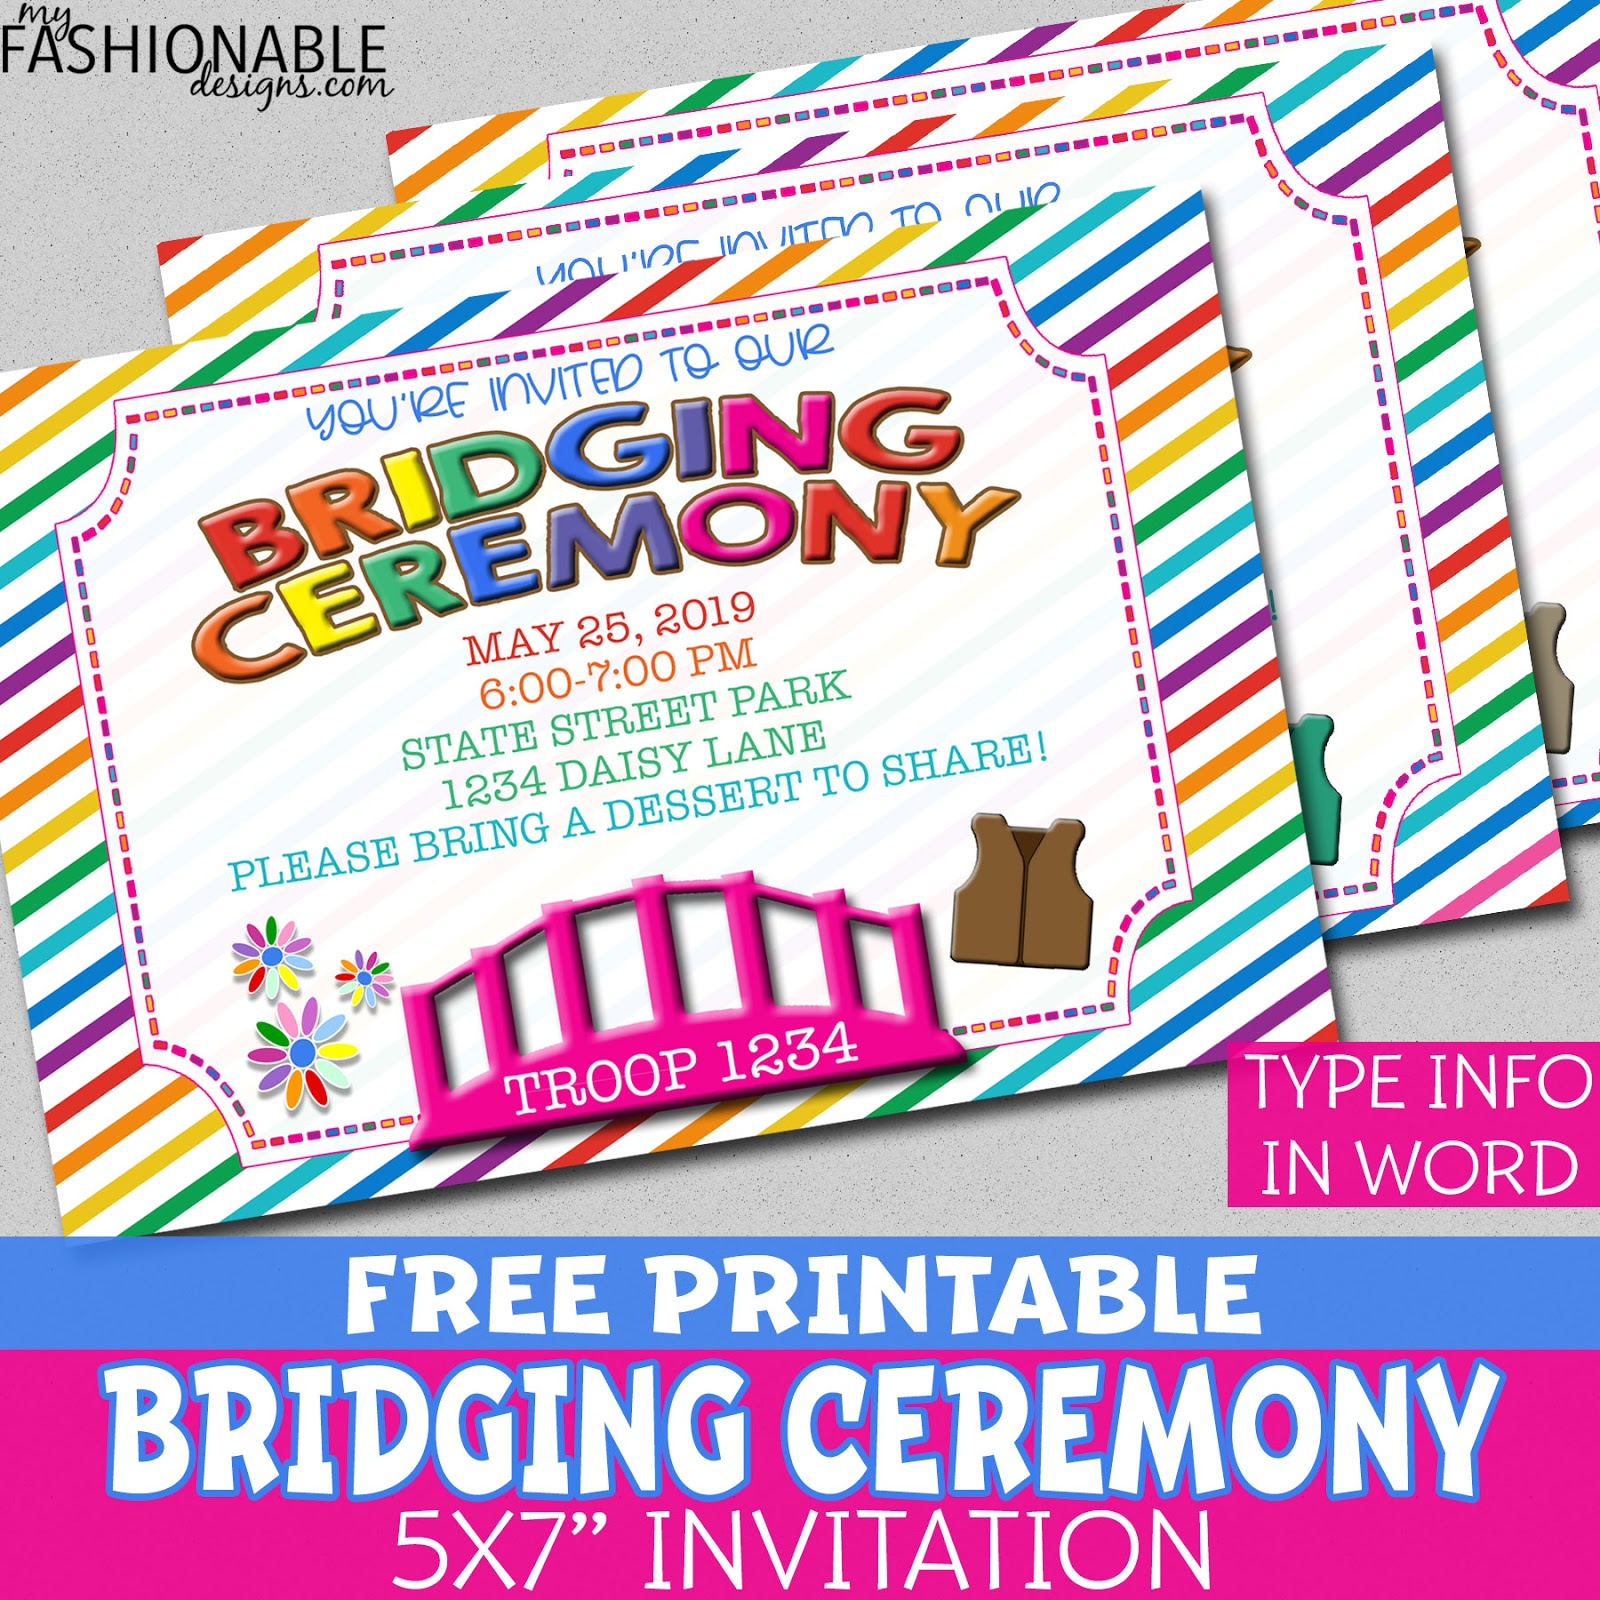 My Fashionable Designs Free Printable Bridging Invitations